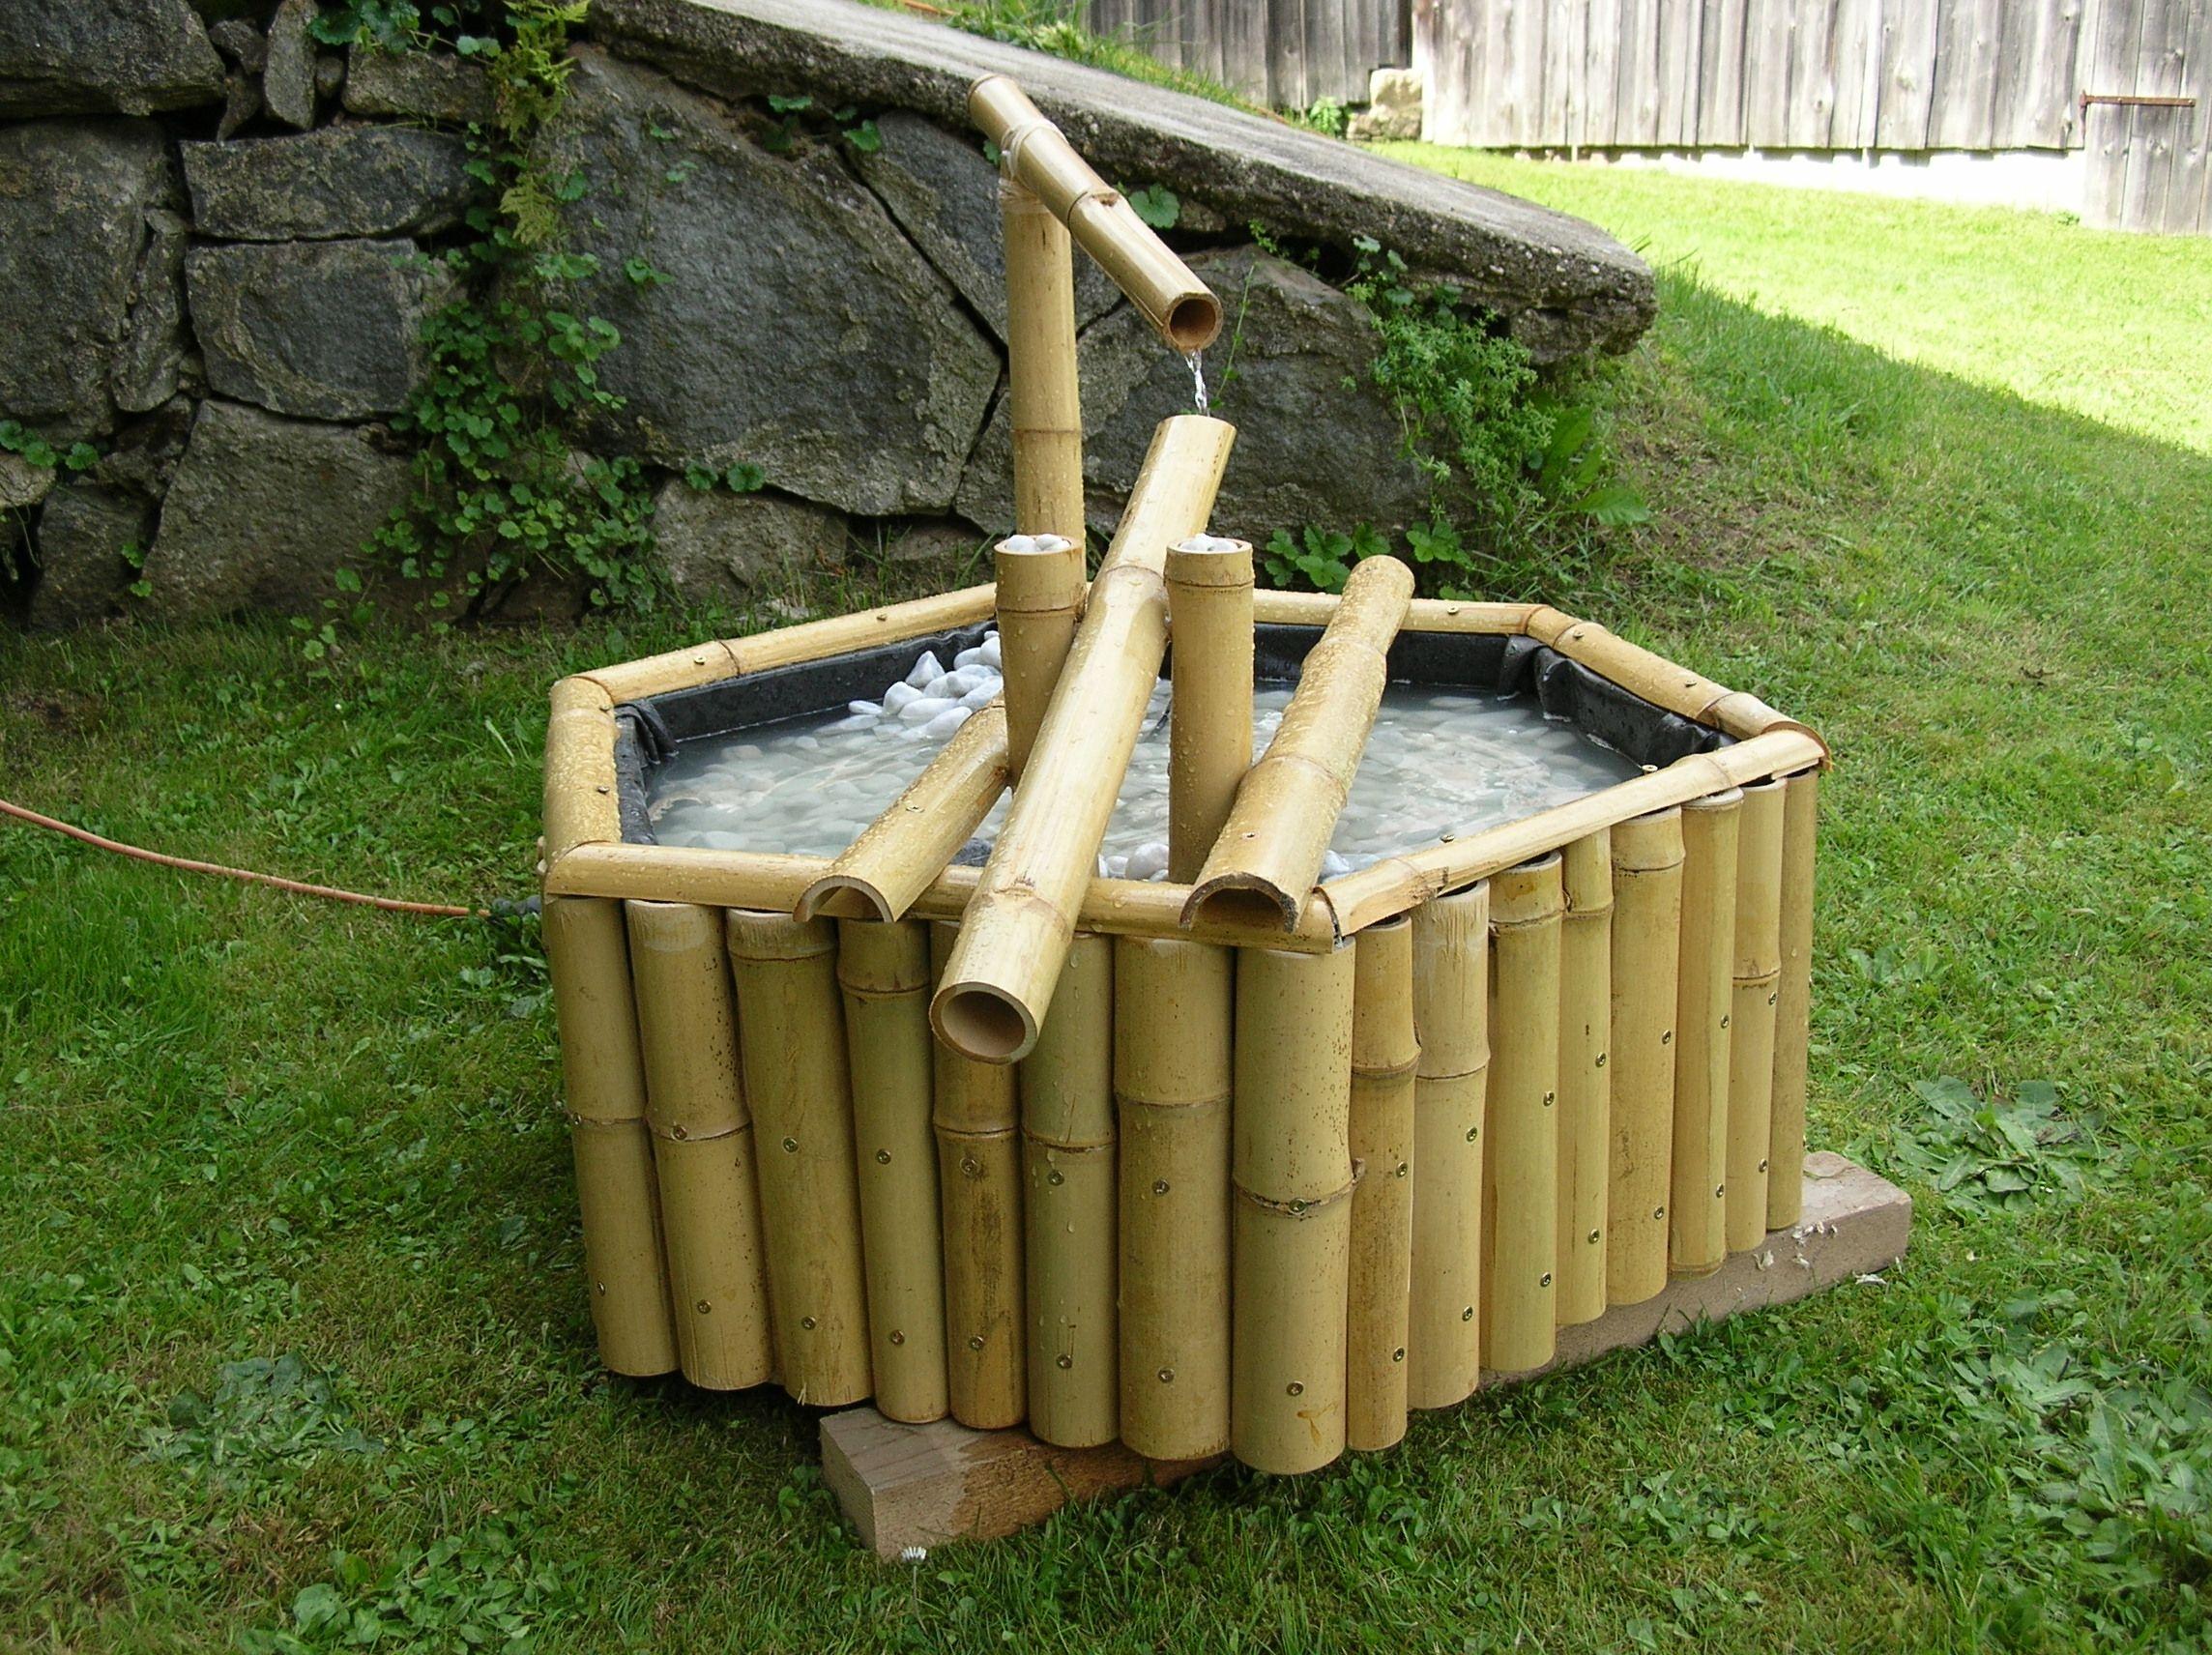 Brunnen Selber Bohren: Wasserbrunnen garten brunnen im gestalteten ...